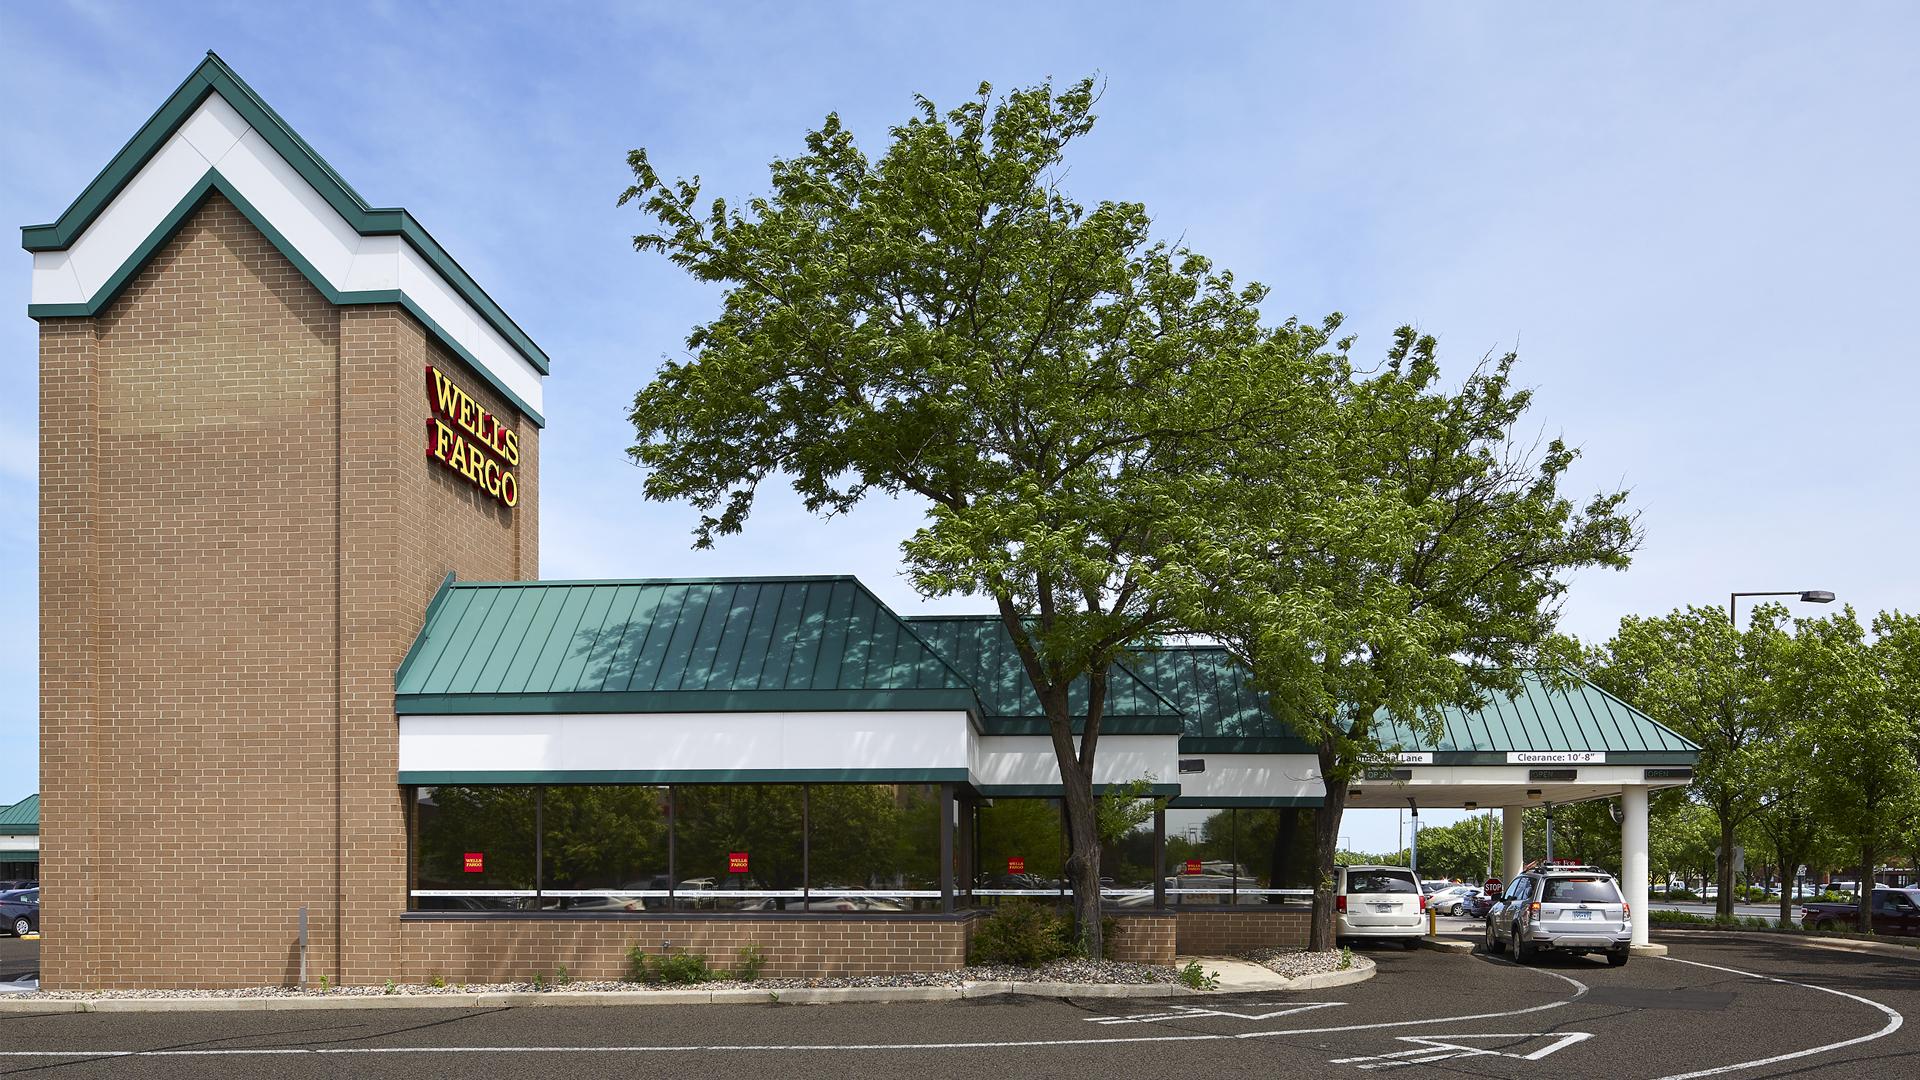 Clover Retail Shopping Center Wells Fargo Bank Tower and Drive Thru View